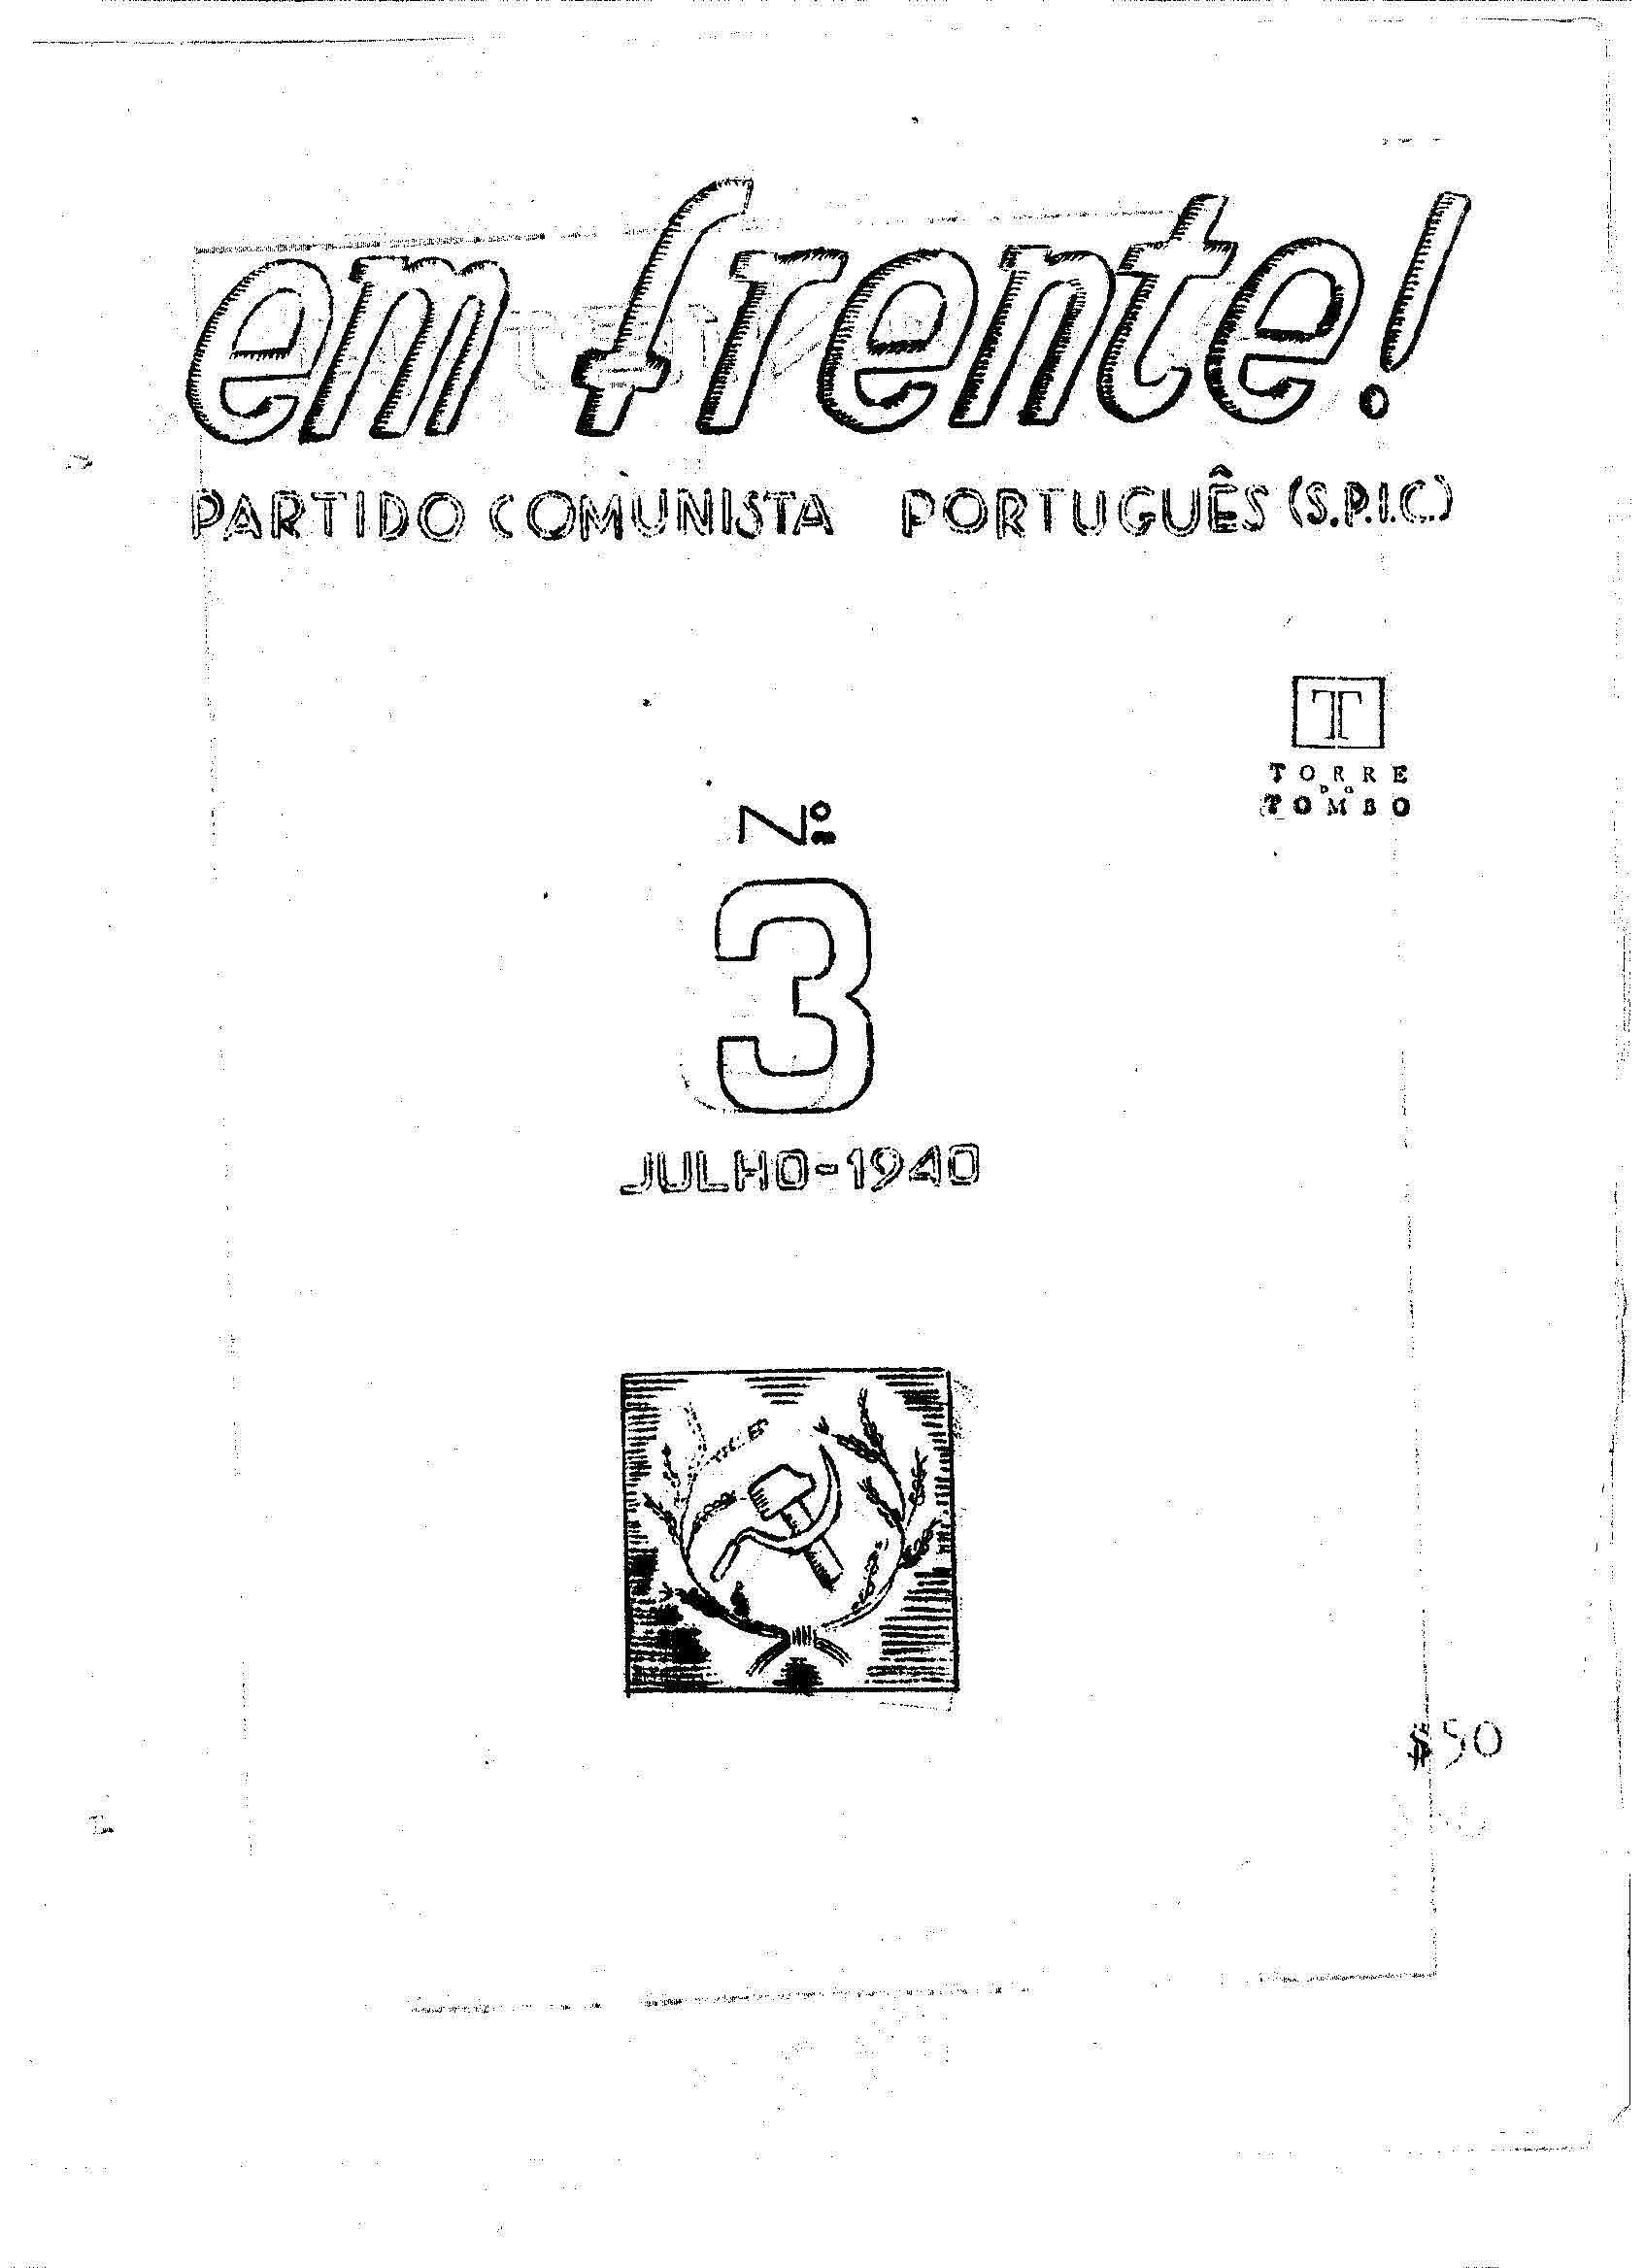 Copy of Agosto 12, 1999 (6)